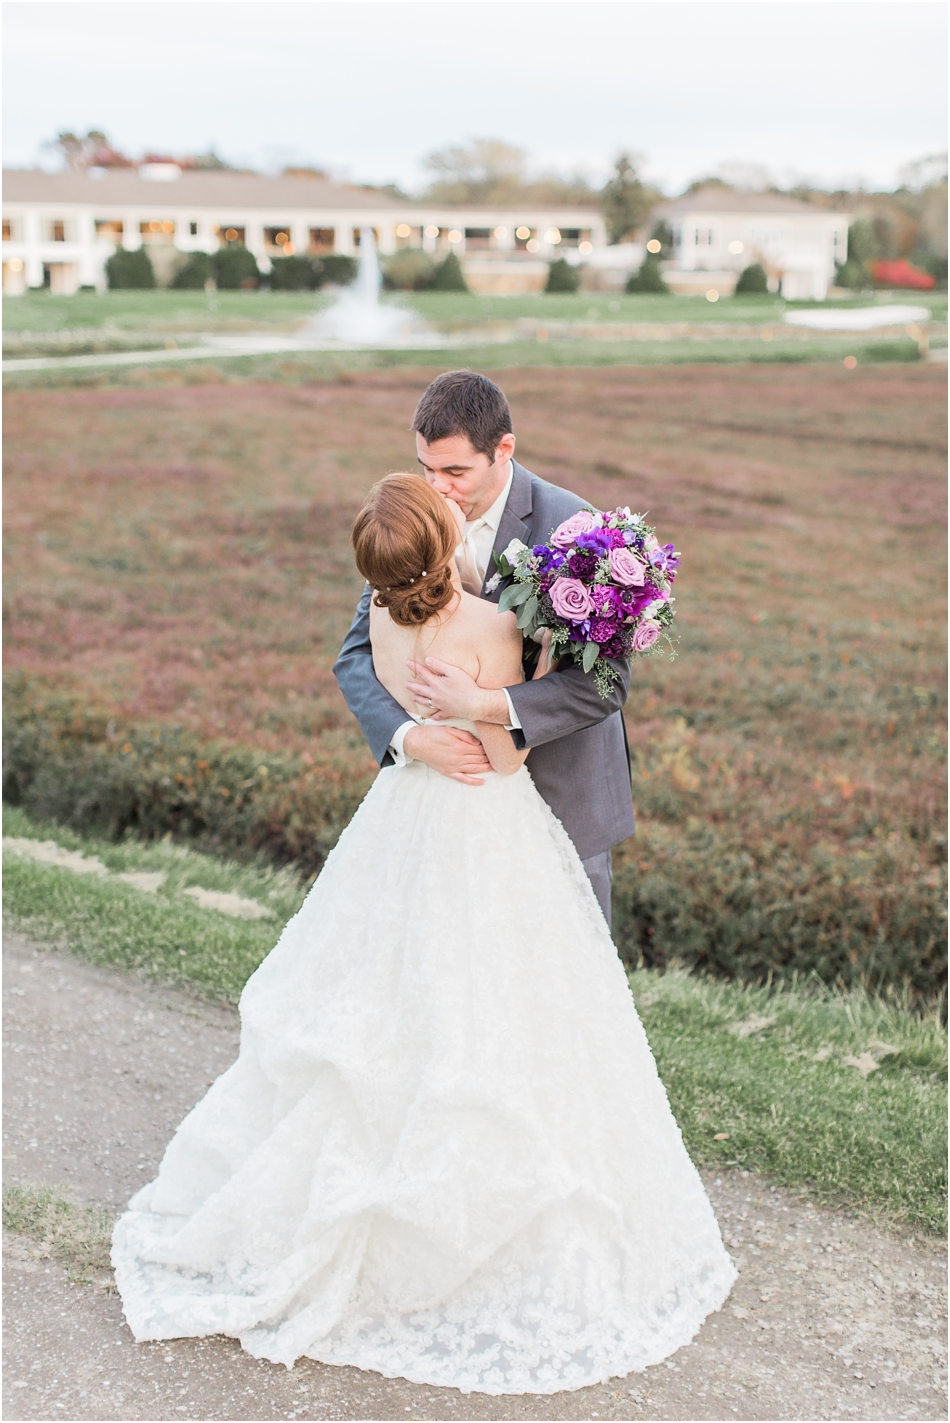 willowbend_megan_david_country_club_cape_cod_boston_new_england_wedding_photographer_Meredith_Jane_Photography_photo_0212.jpg